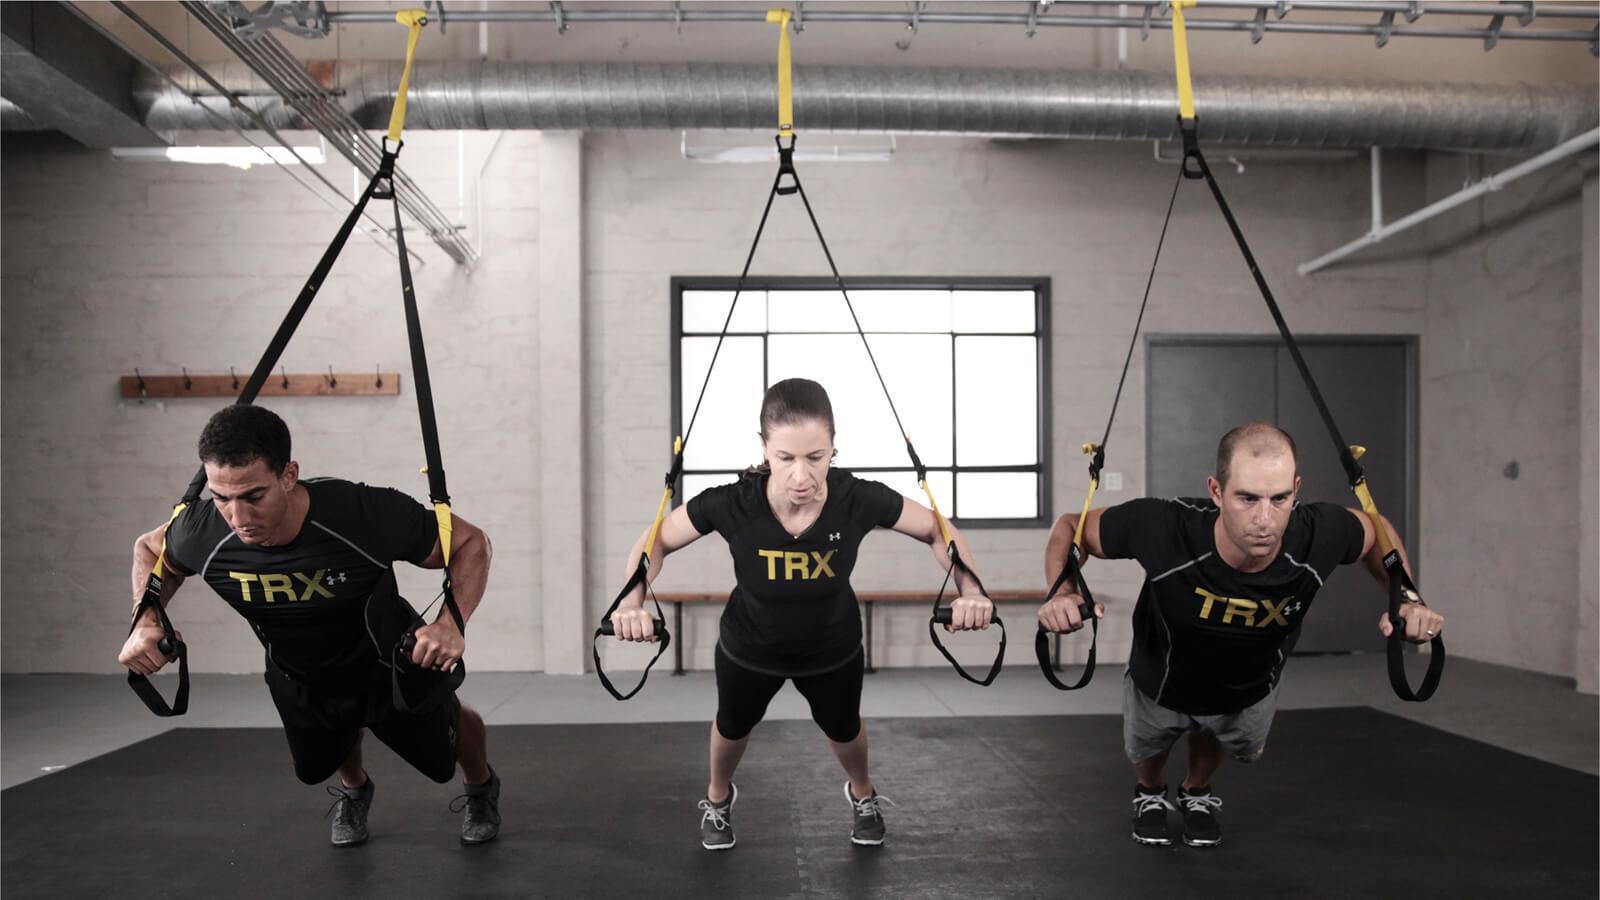 TRX: Functional training in sospensione